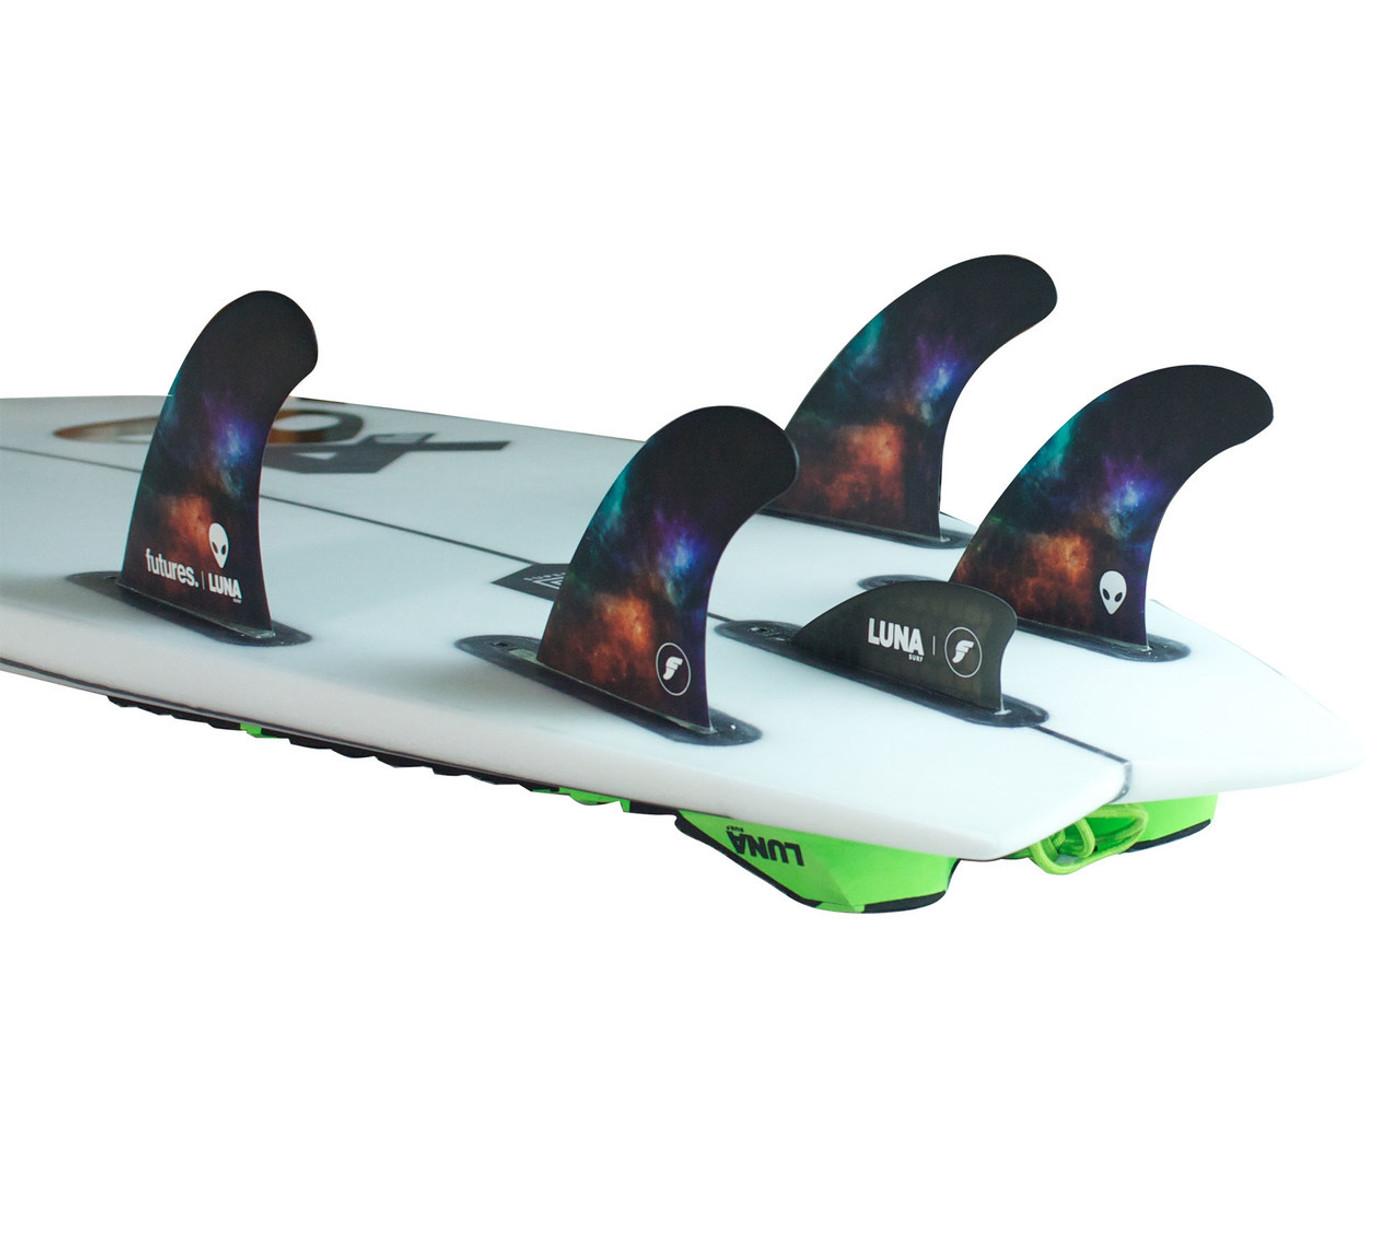 Luna Knubster in use with the Lunasurf quad fins